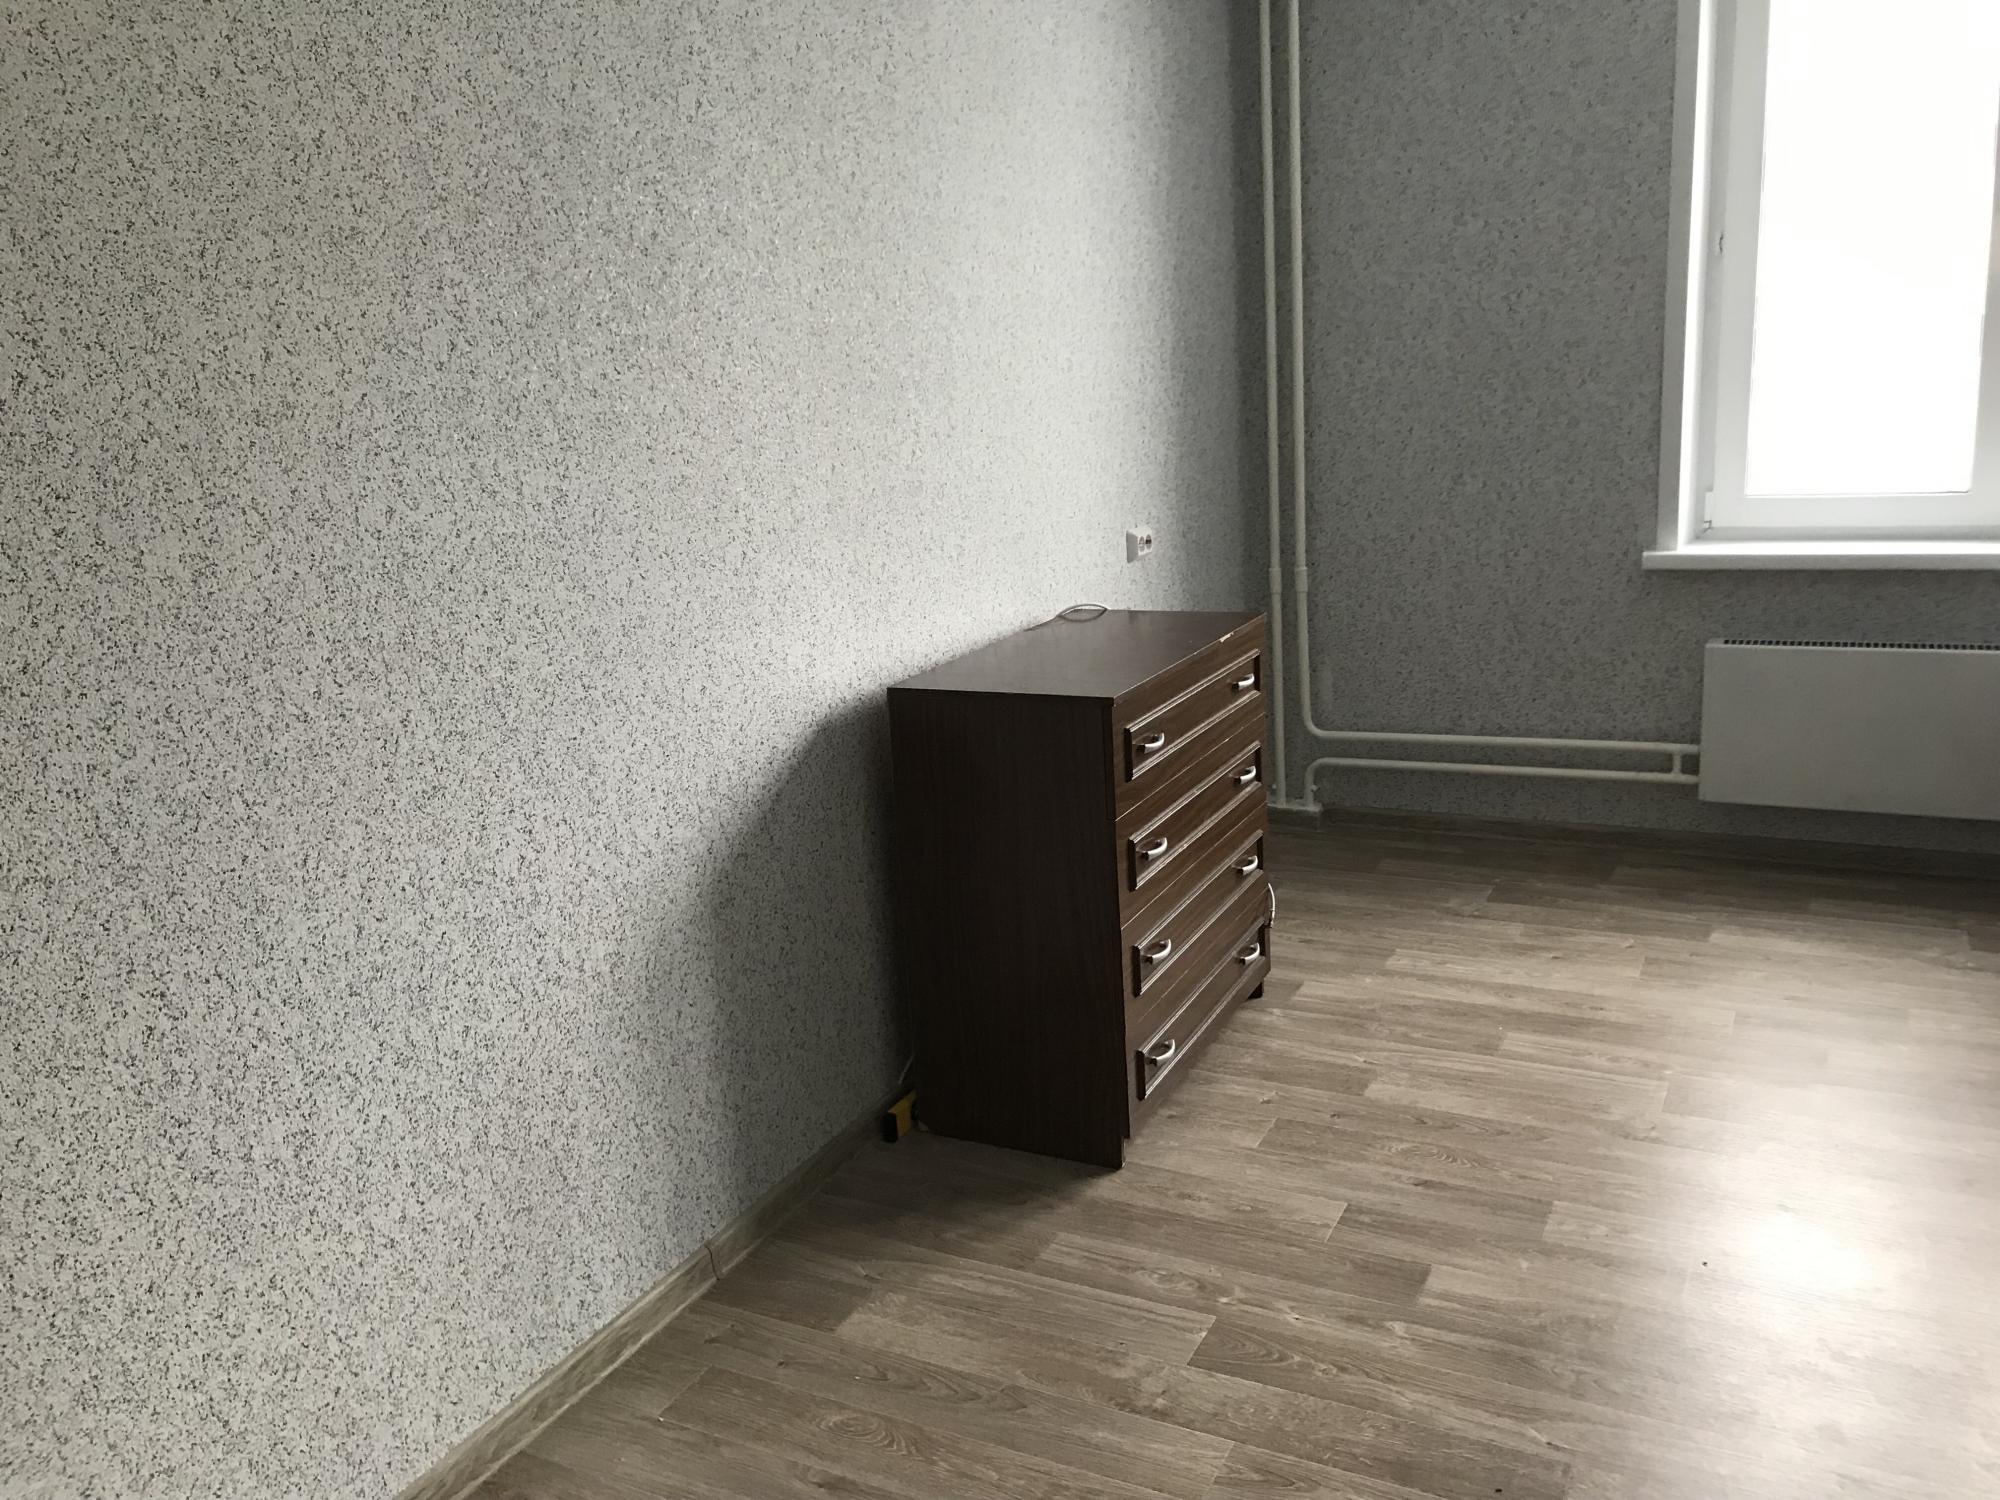 2к квартира улица Партизана Железняка, 59   18000   аренда в Красноярске фото 3